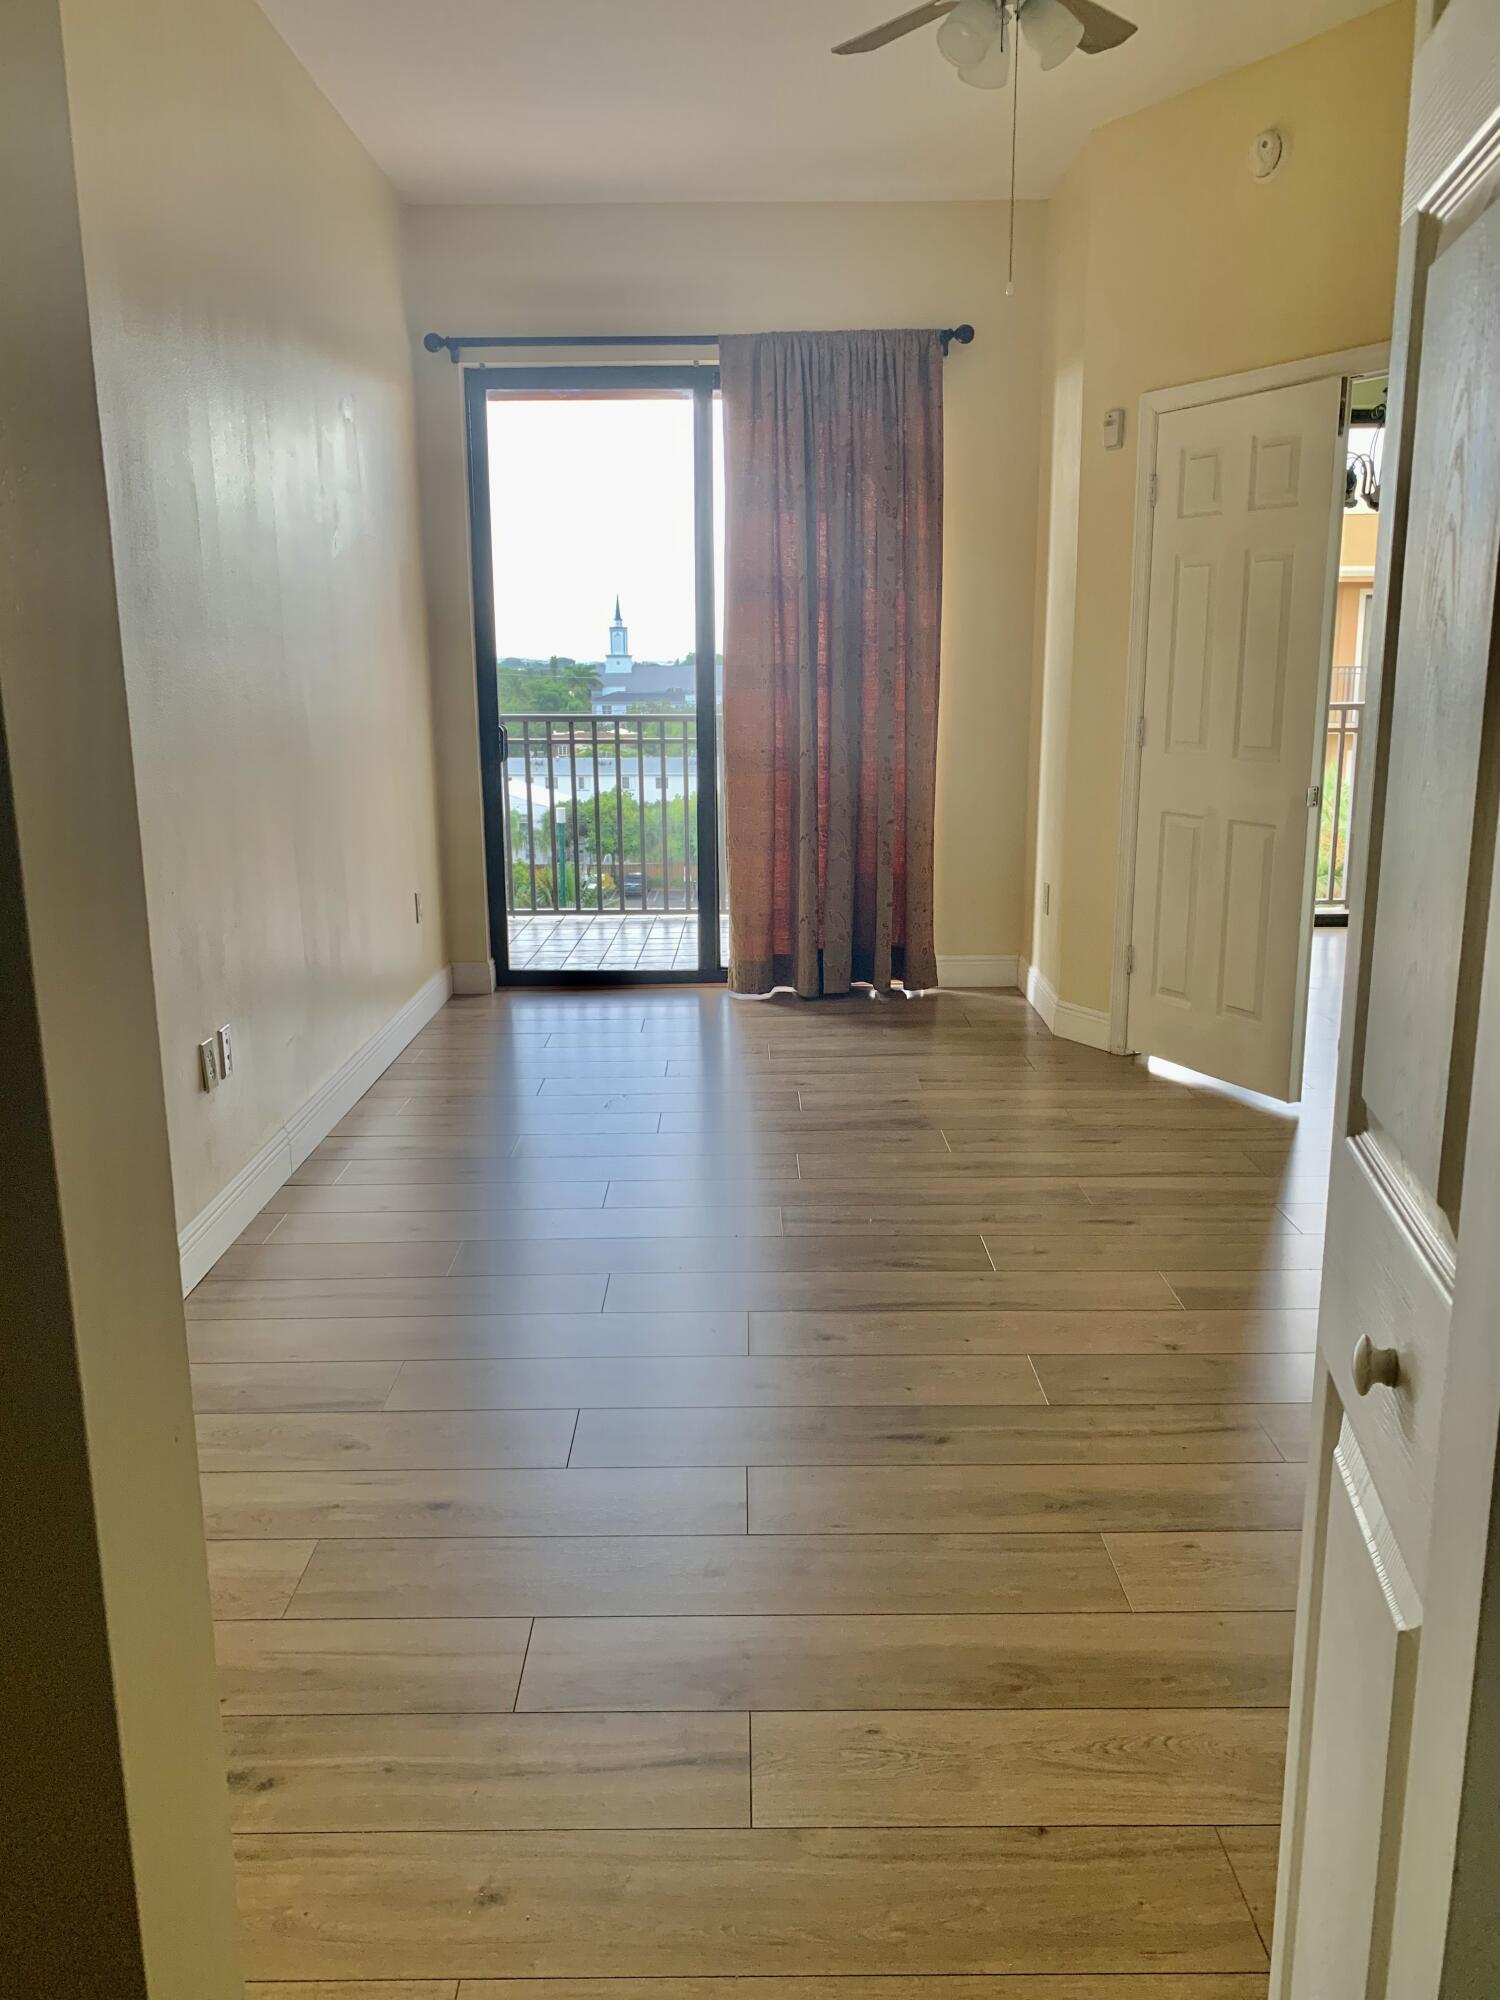 Primary Bedroom new flooring